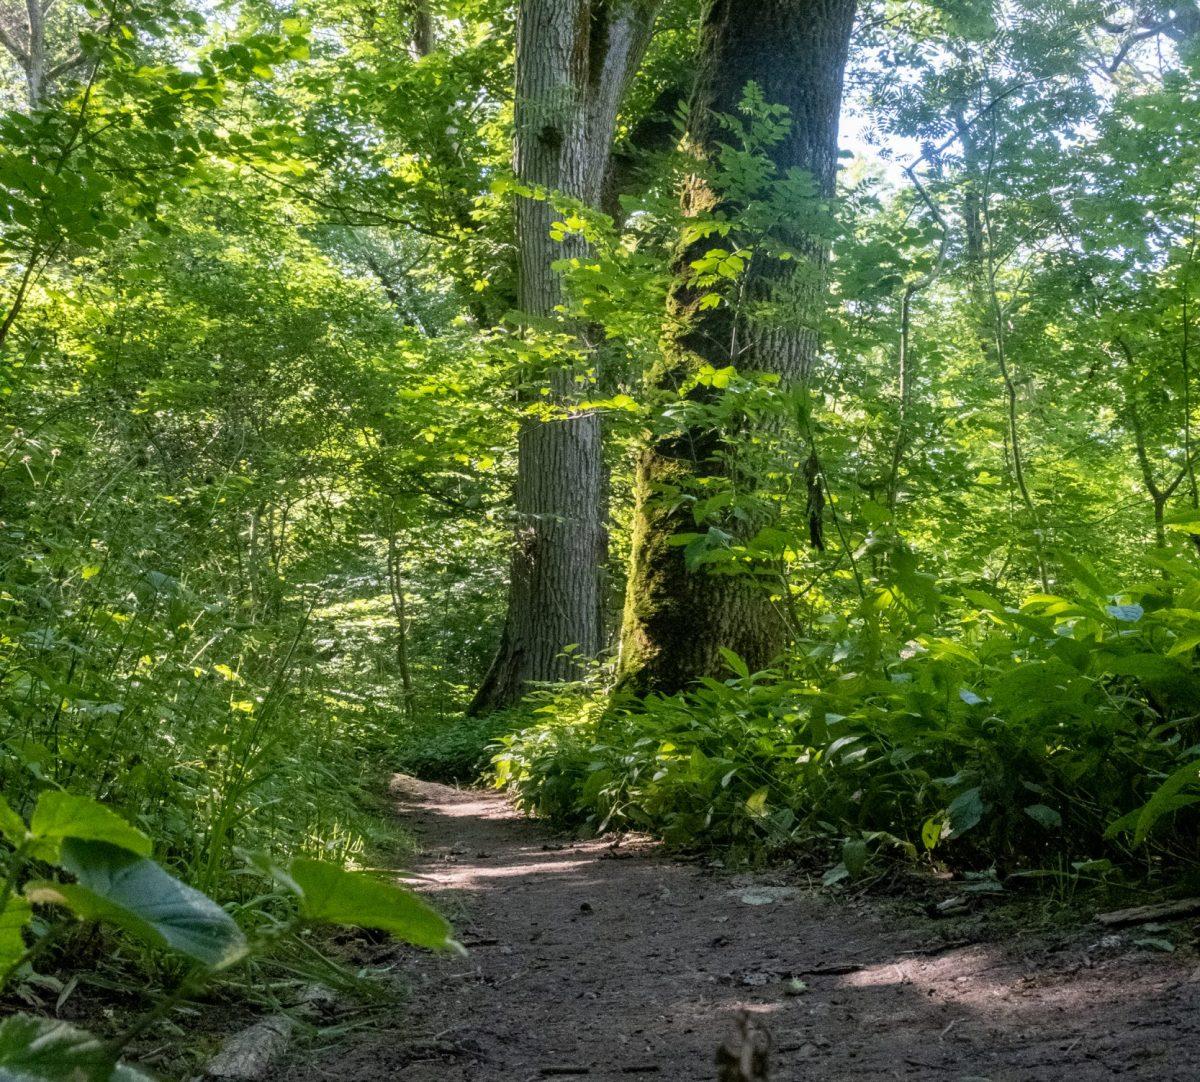 Upptrampad stig i skog. Foto.